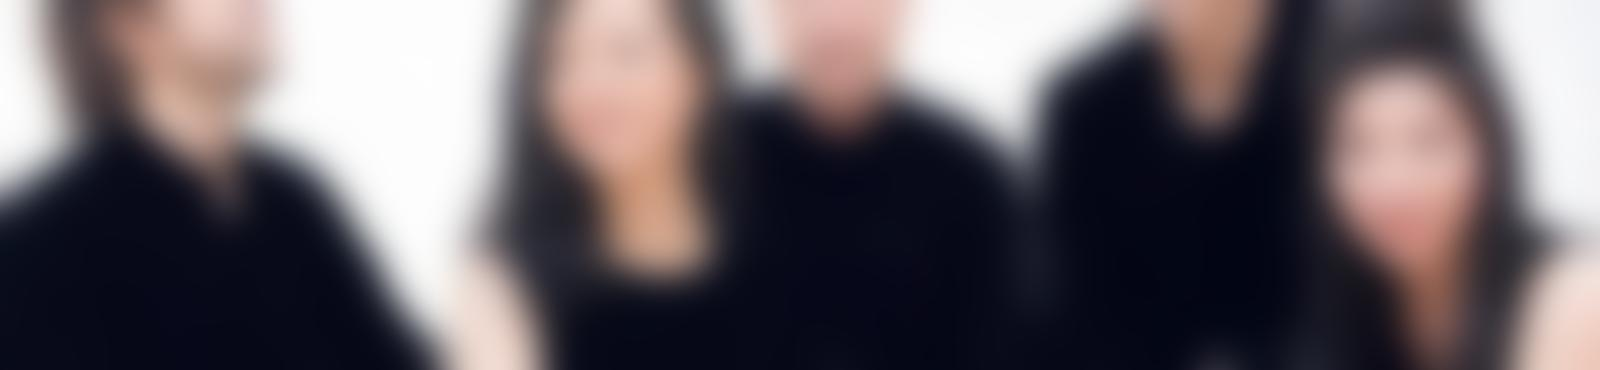 Blurred b4ae8d82 5518 49f0 8d2e 00eb9170f933